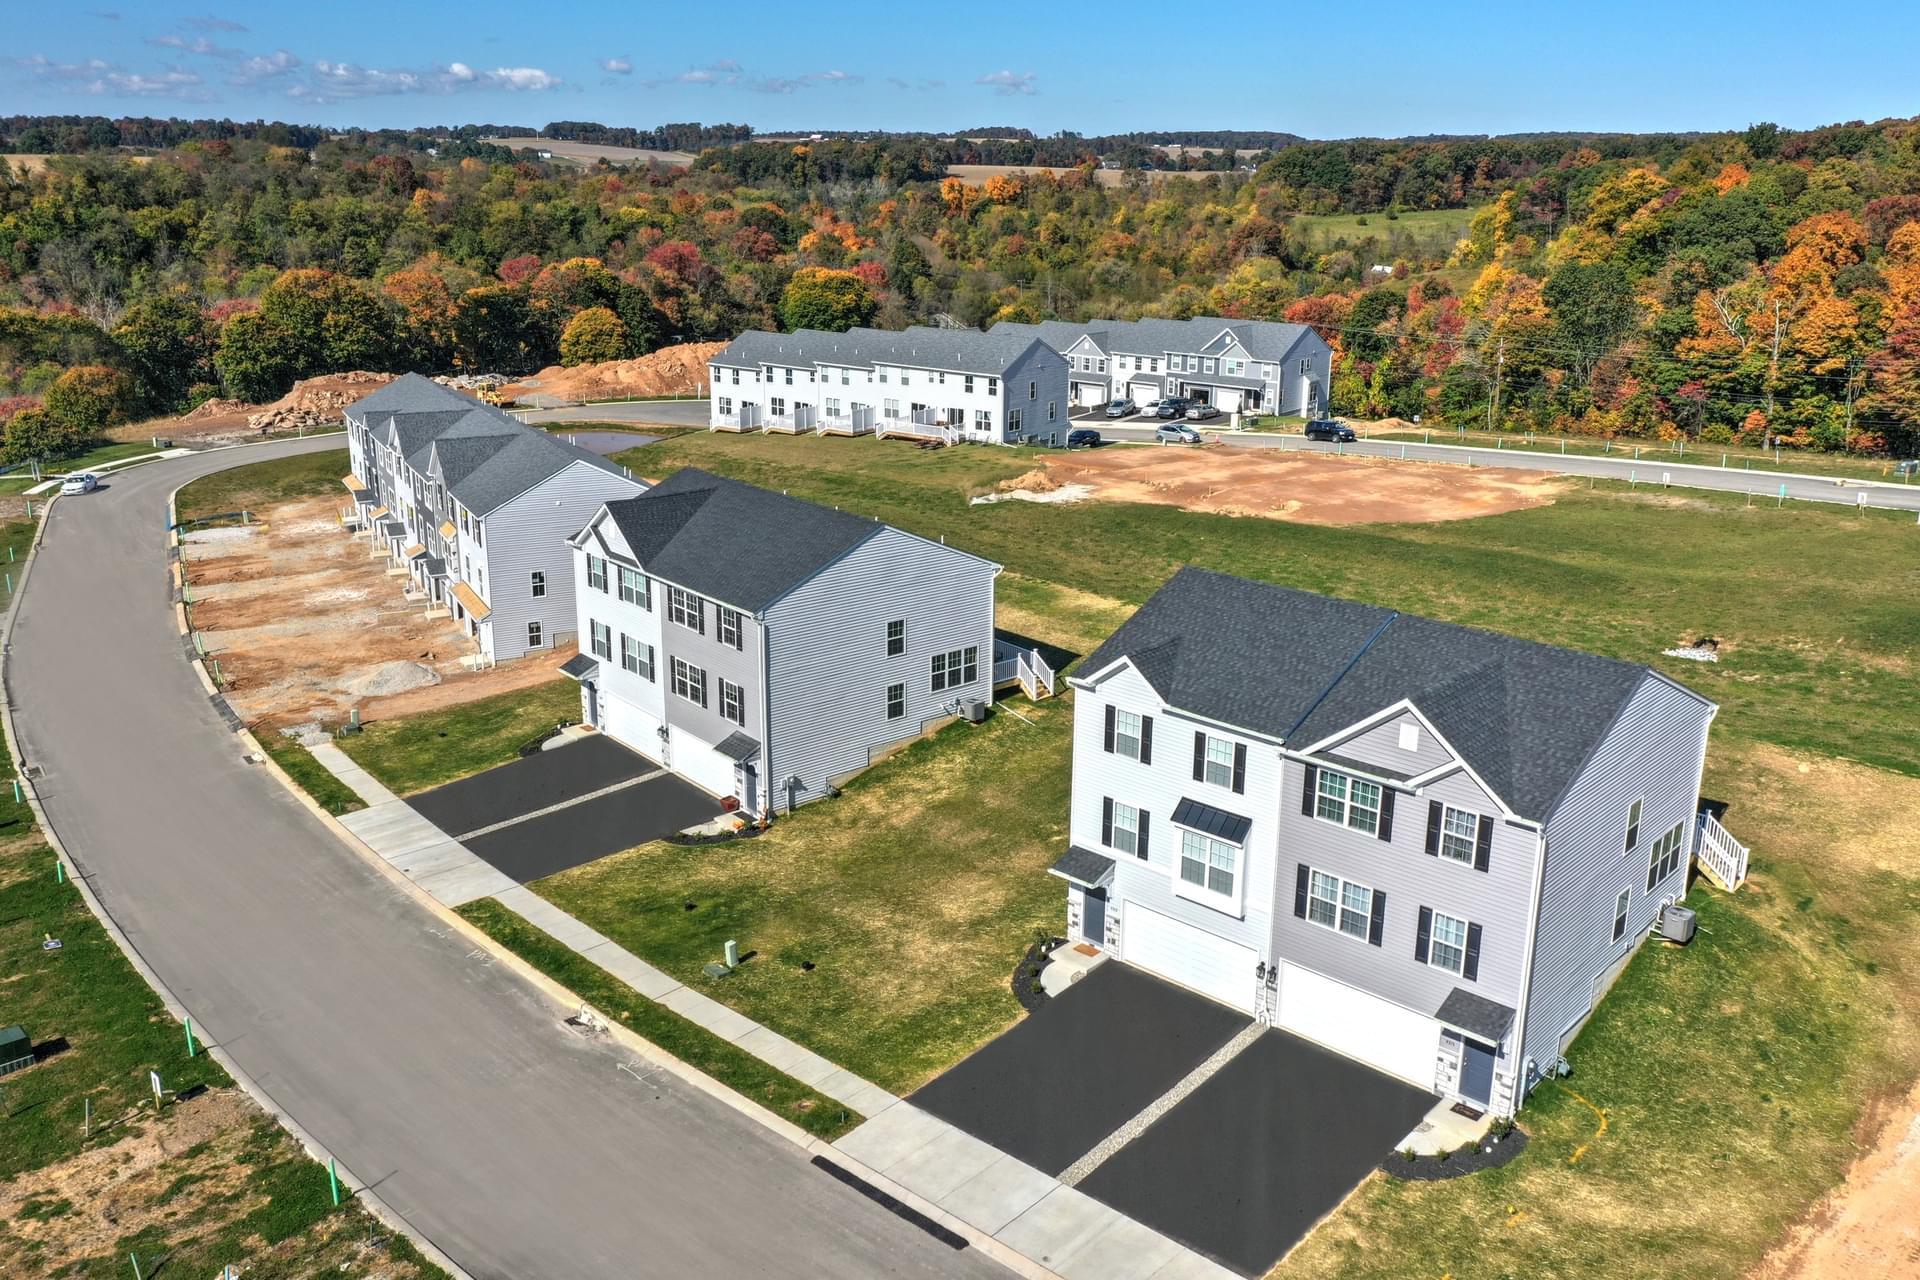 Berks Homes in 4333 Blackburn Dr, Stewartstown, PA 17363 PA